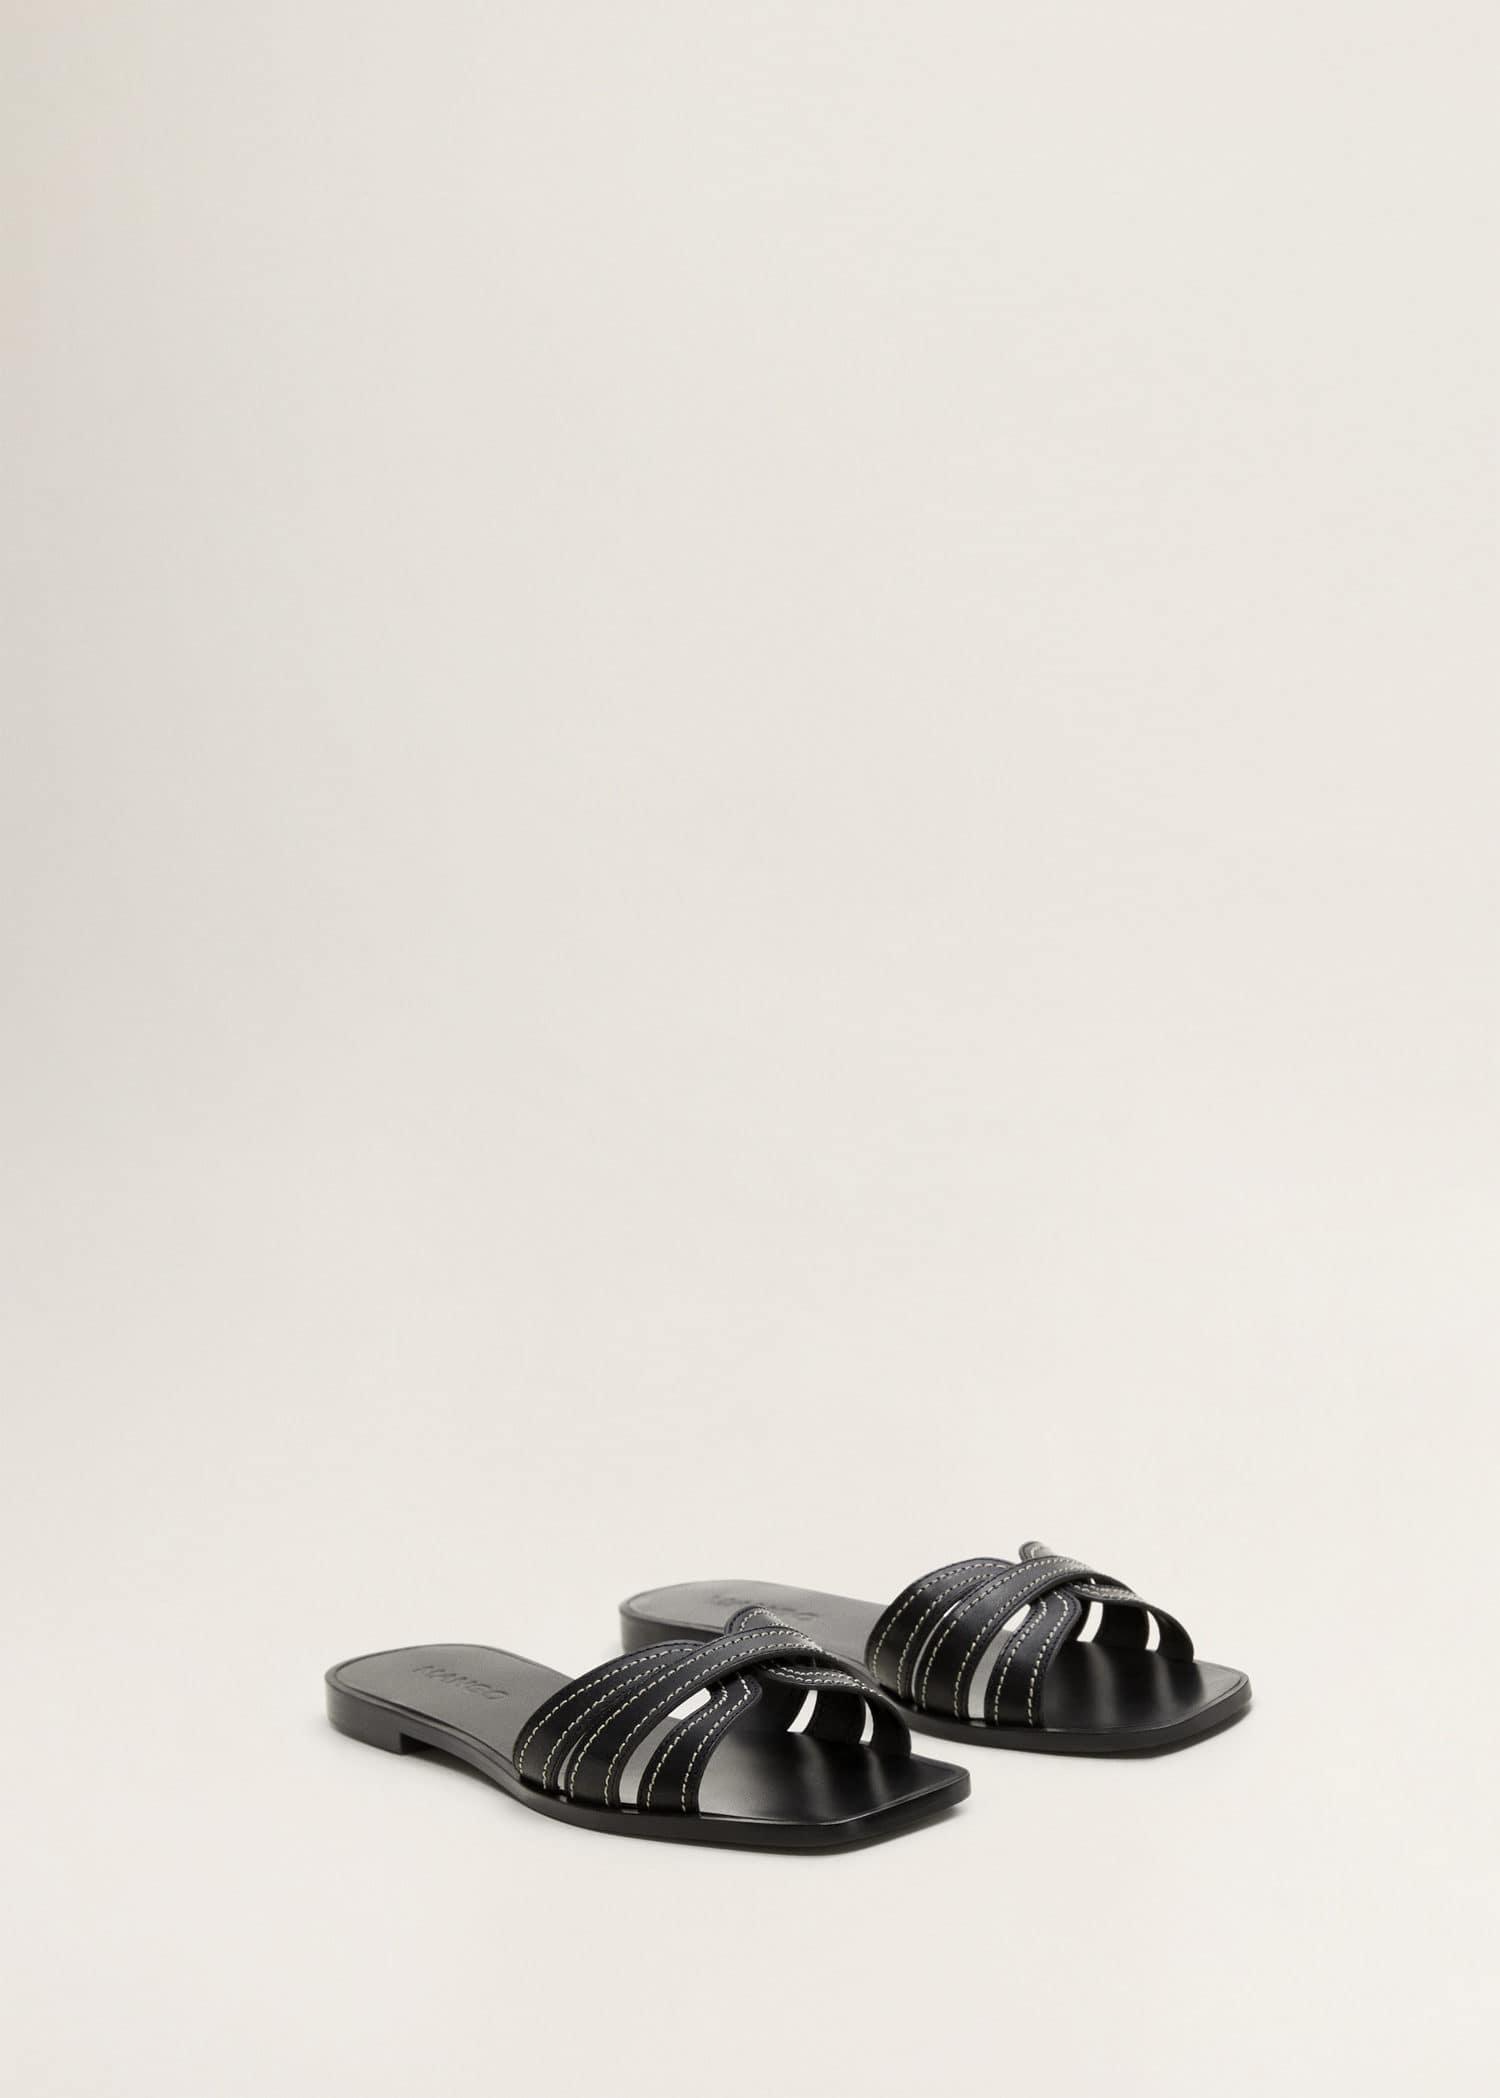 Sandals Pakistan Straps Leather Straps Leather Sandals WomanMango 8n0PkwO